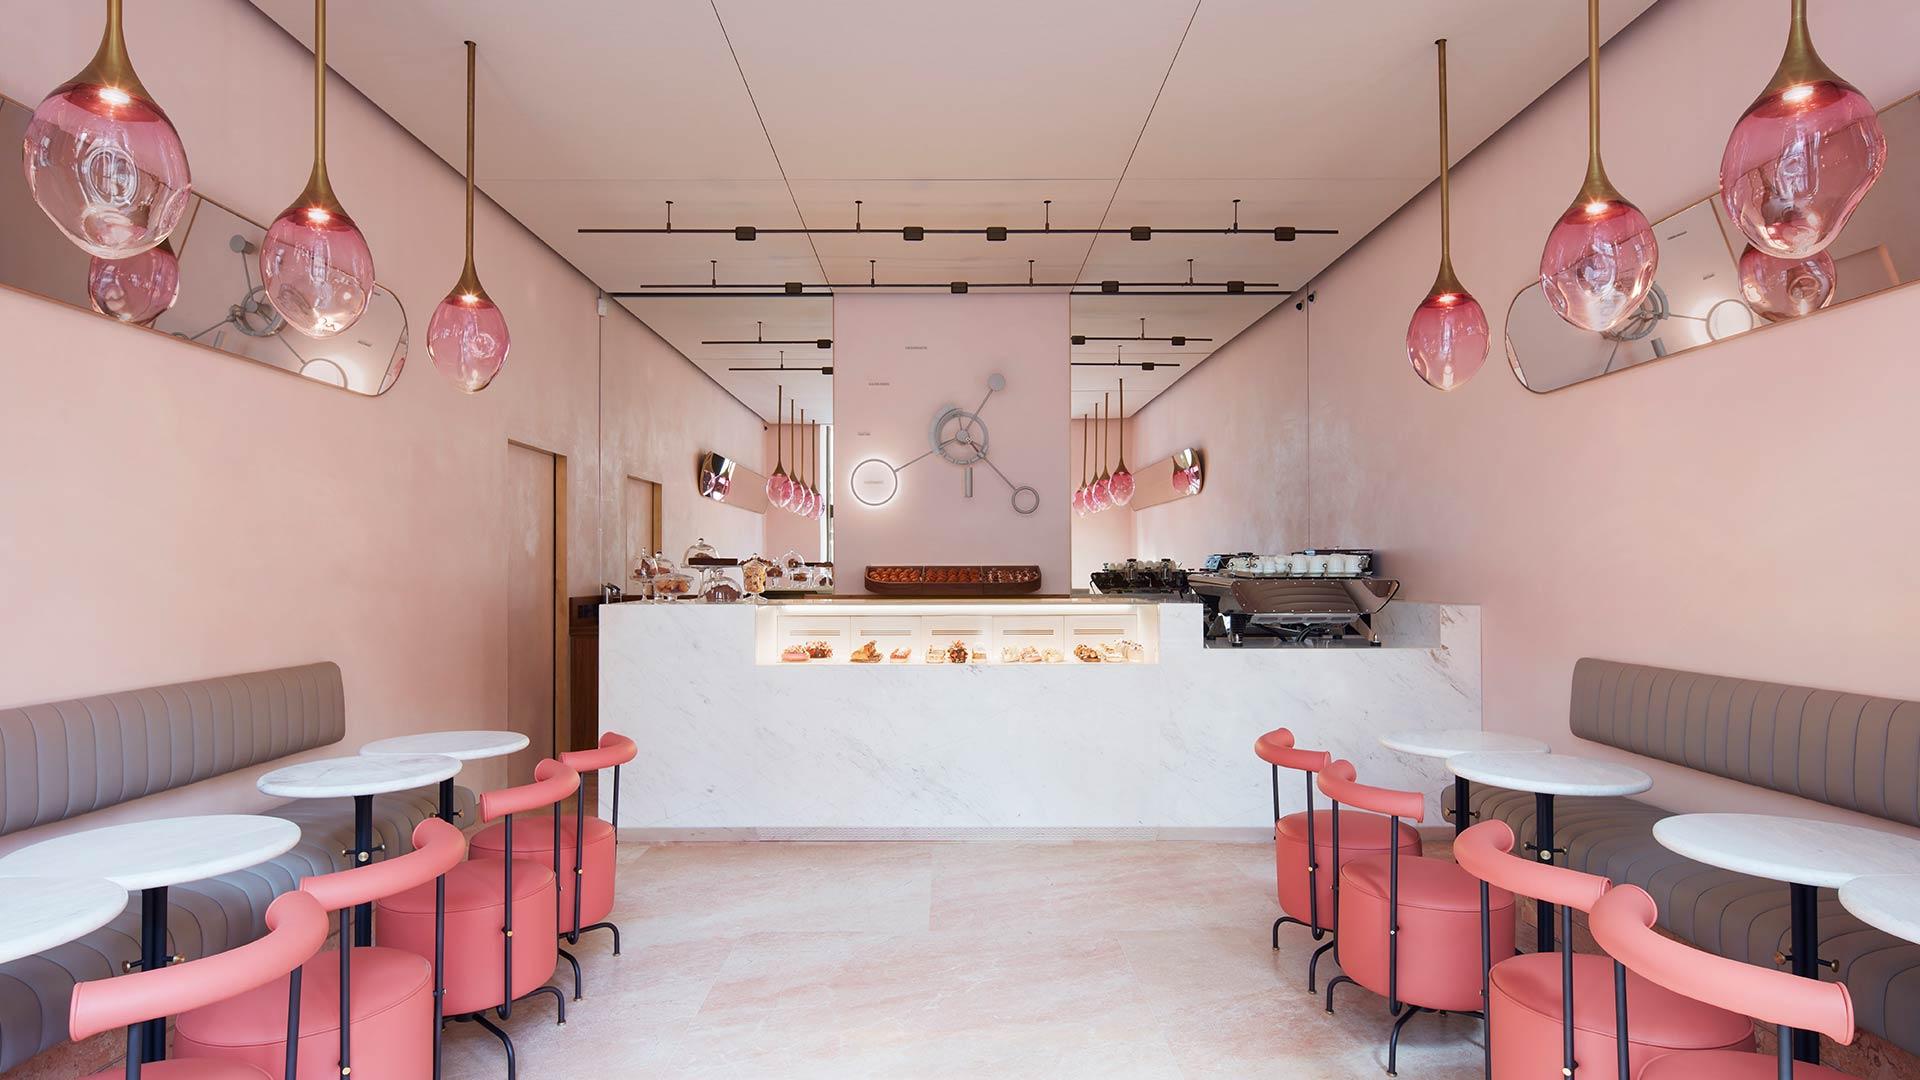 Lighting Scheme Stylish Dusty Pink Interior Palette Luxury Patisserie Cake Shop Mayfair Consultants Nulty